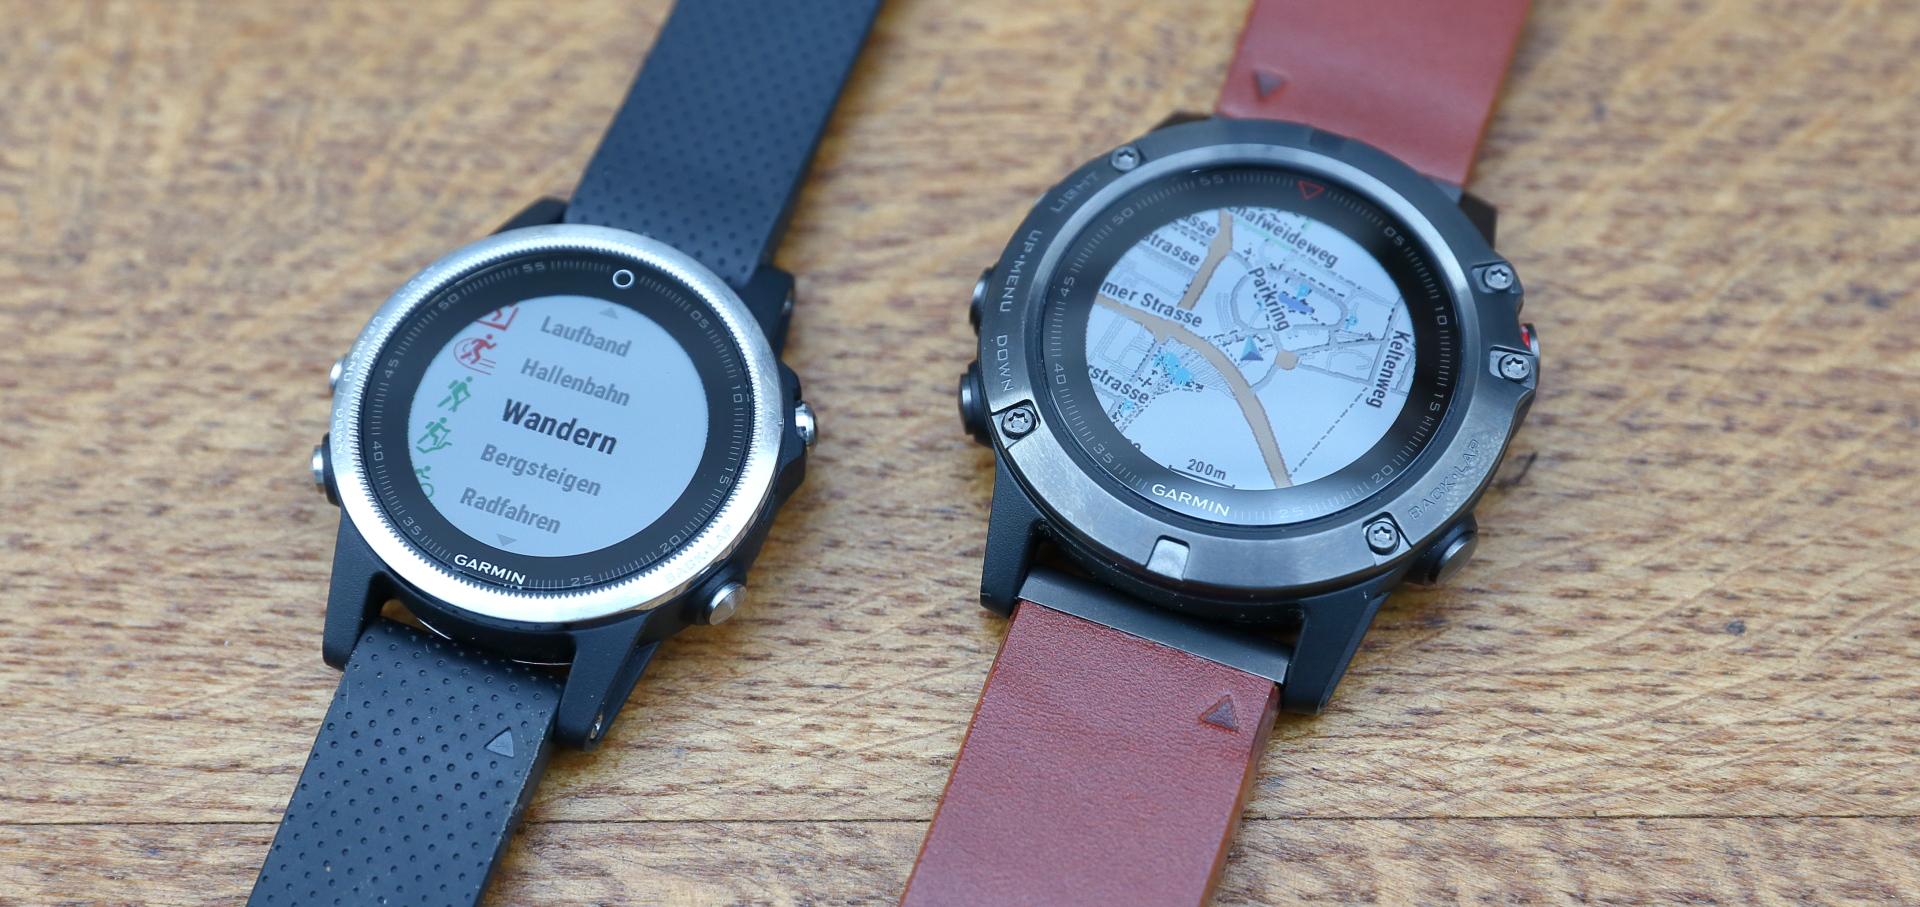 Garmin Fenix 5x Gps Uhr Im Test Navigation 5 Sapphire Slate Grey 5s Links Rechts